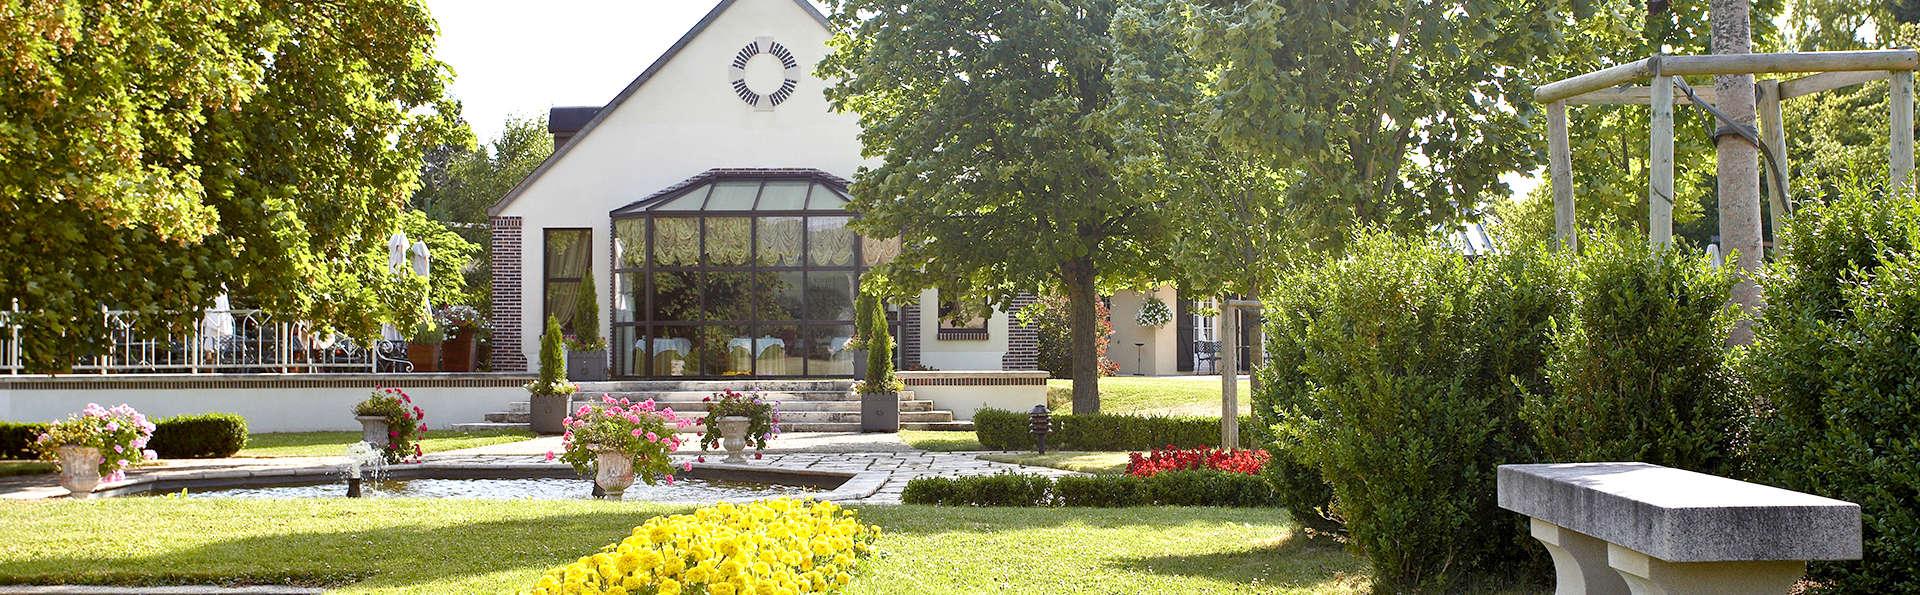 Hostellerie La Briqueterie - EDIT_NEW_FROTN.jpg